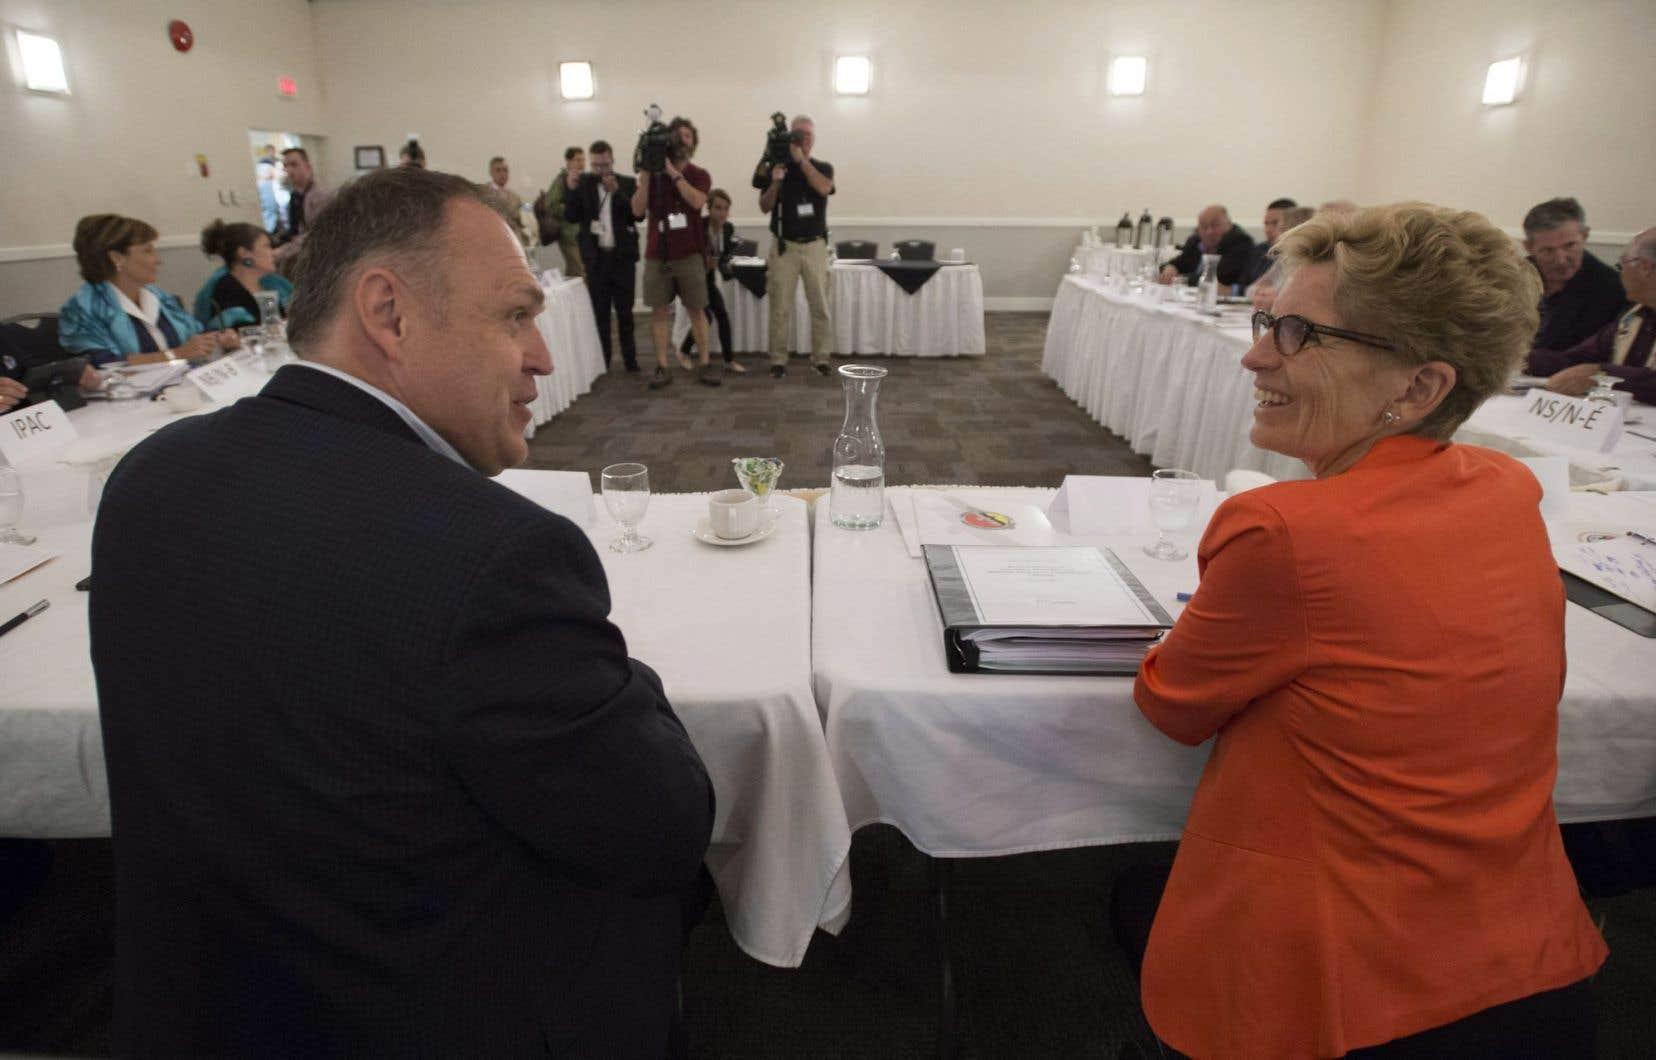 Le premier ministre du Yukon, Darrell Pasloski, discute avec la première ministre ontarienne, Kathleen Wynne.